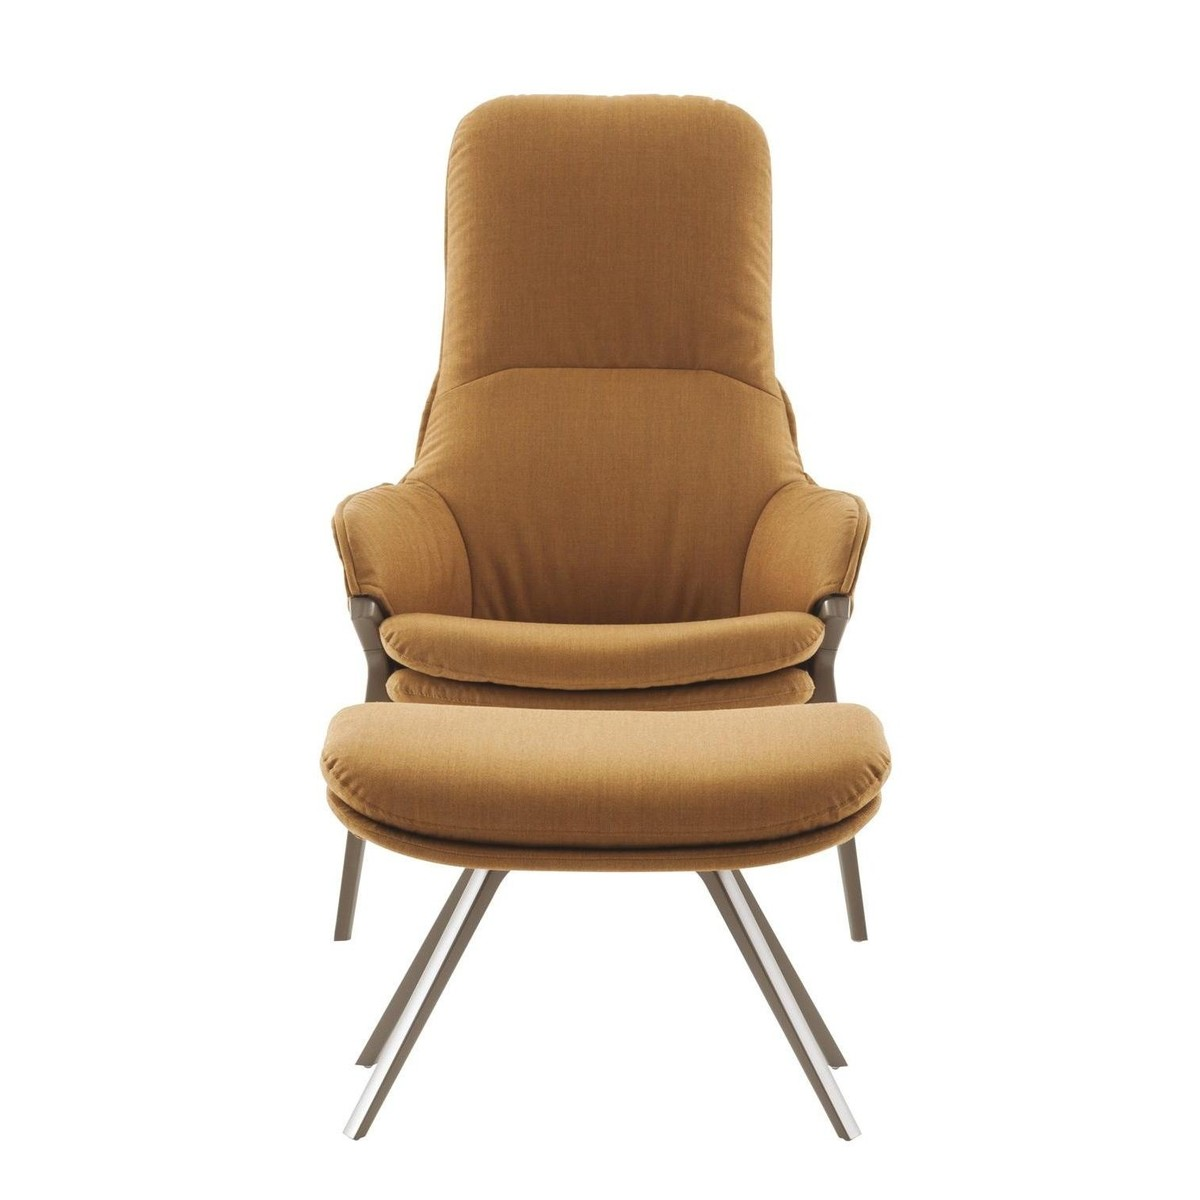 p22 patrick norguet fauteuil cassina. Black Bedroom Furniture Sets. Home Design Ideas